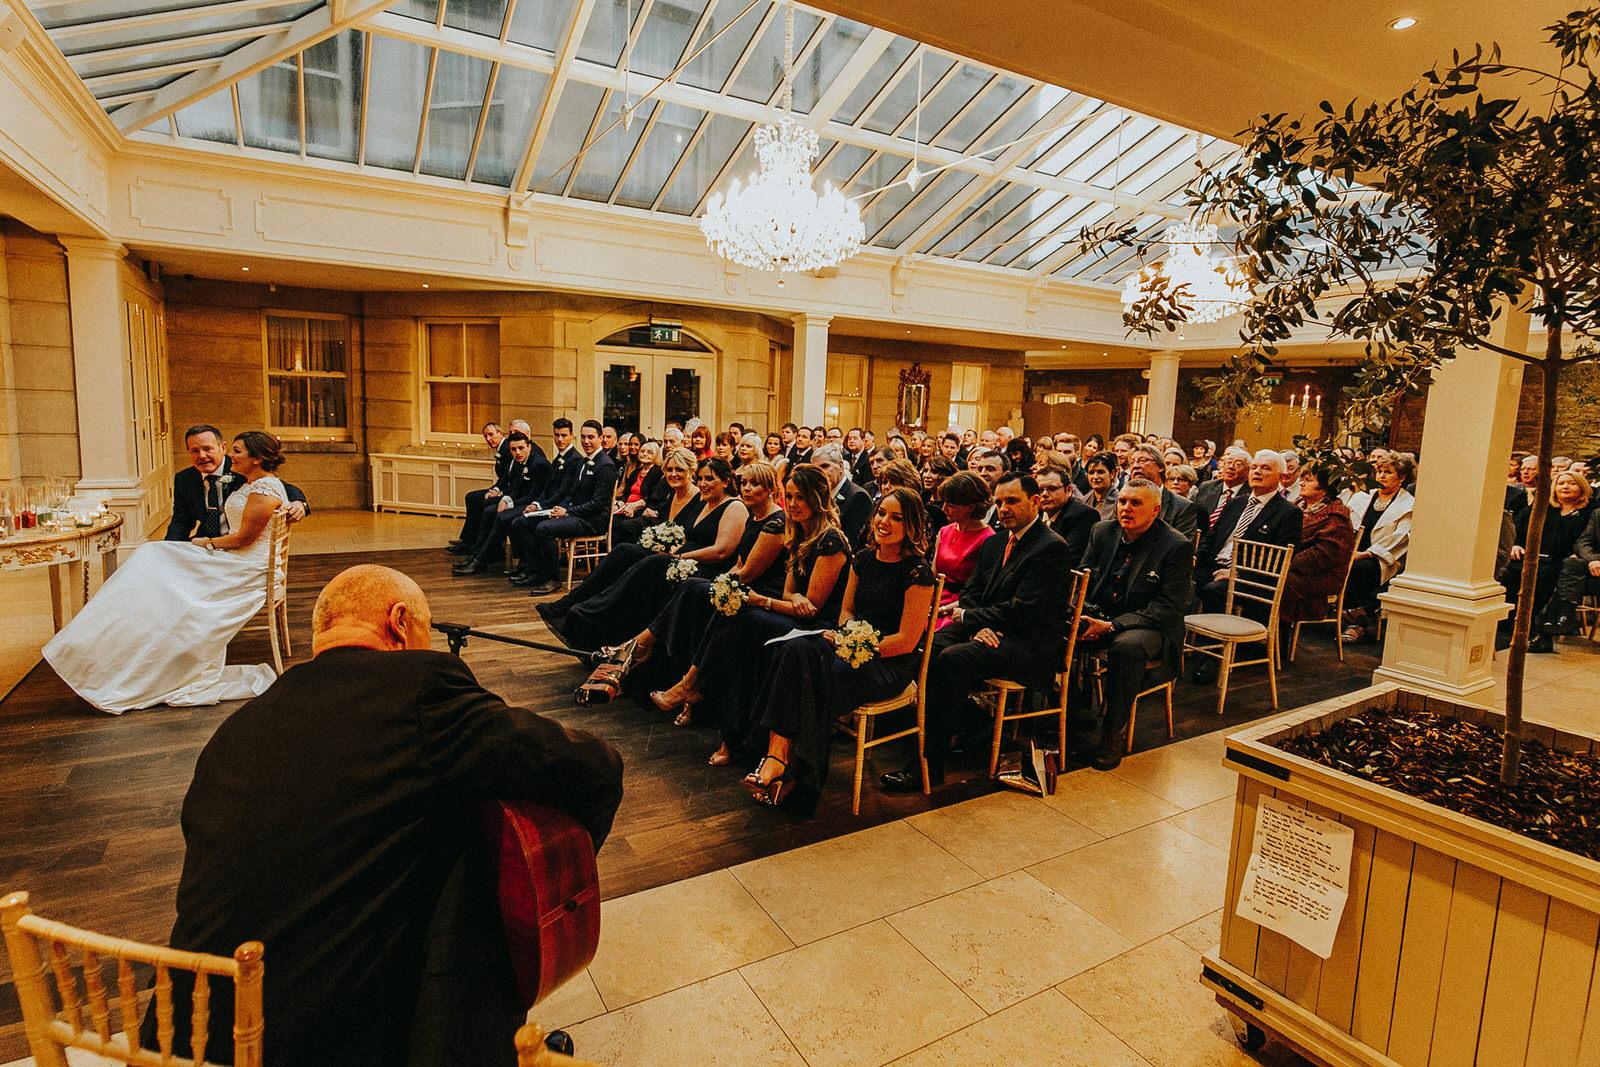 Roger_Kenny_wedding_photographer_Tankardstown_598.jpg